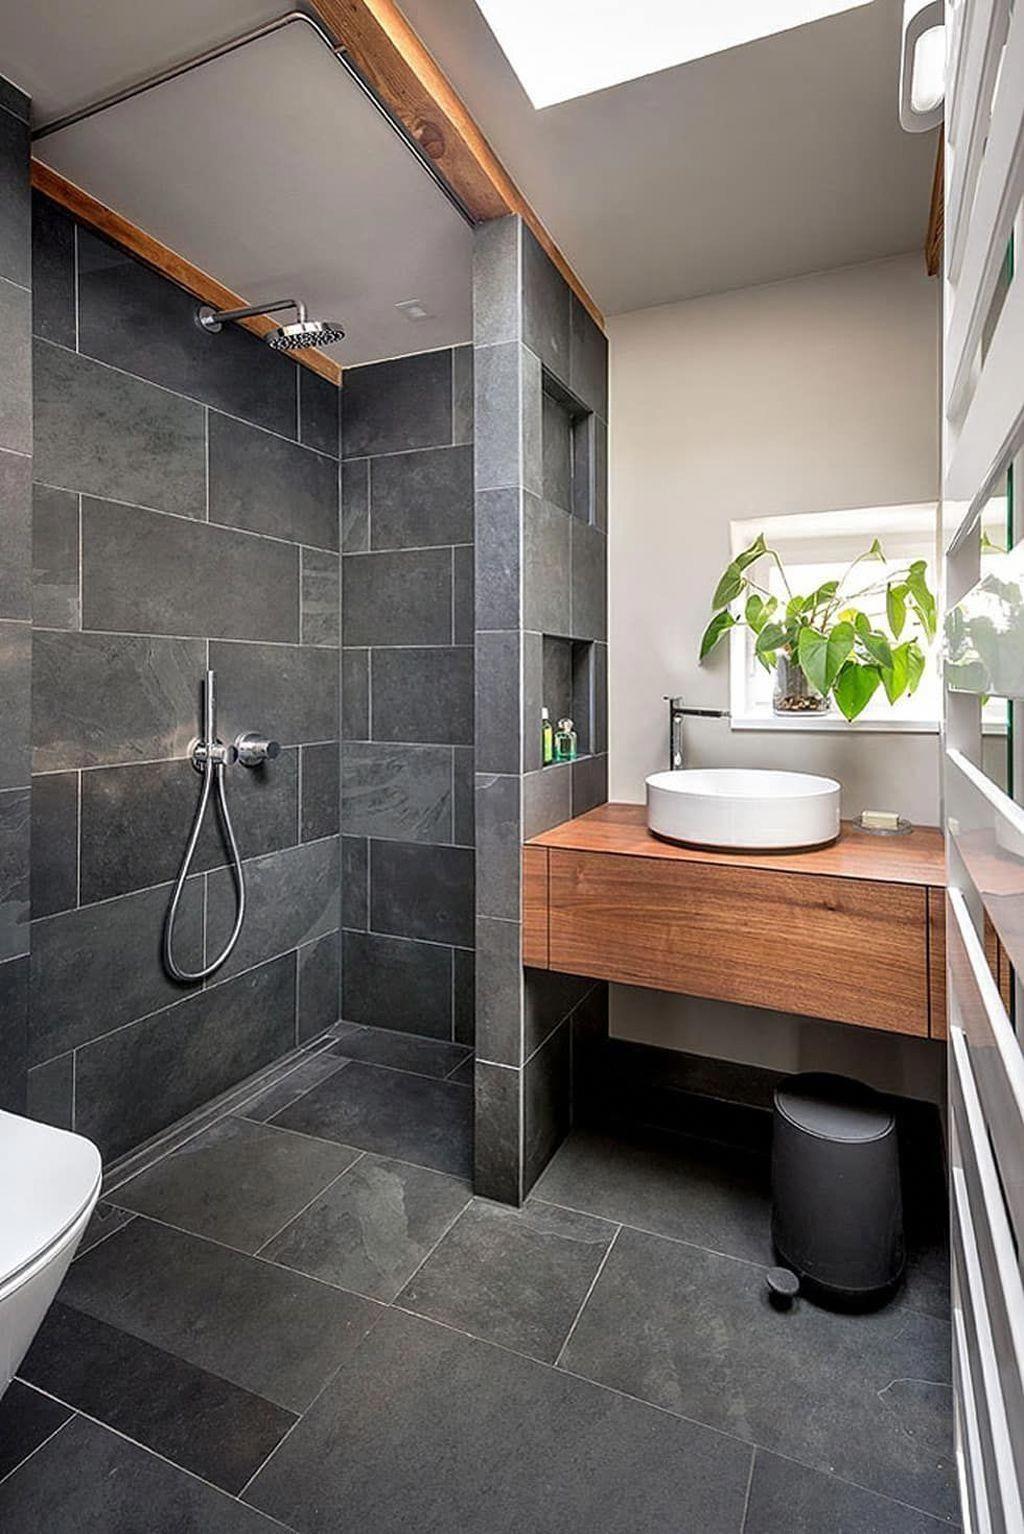 Bathroom Diy Concrete Minimalistbathroomdiy Id 2810283338 Trendy Bathroom Designs Trendy Bathroom Tiles Bathroom Layout